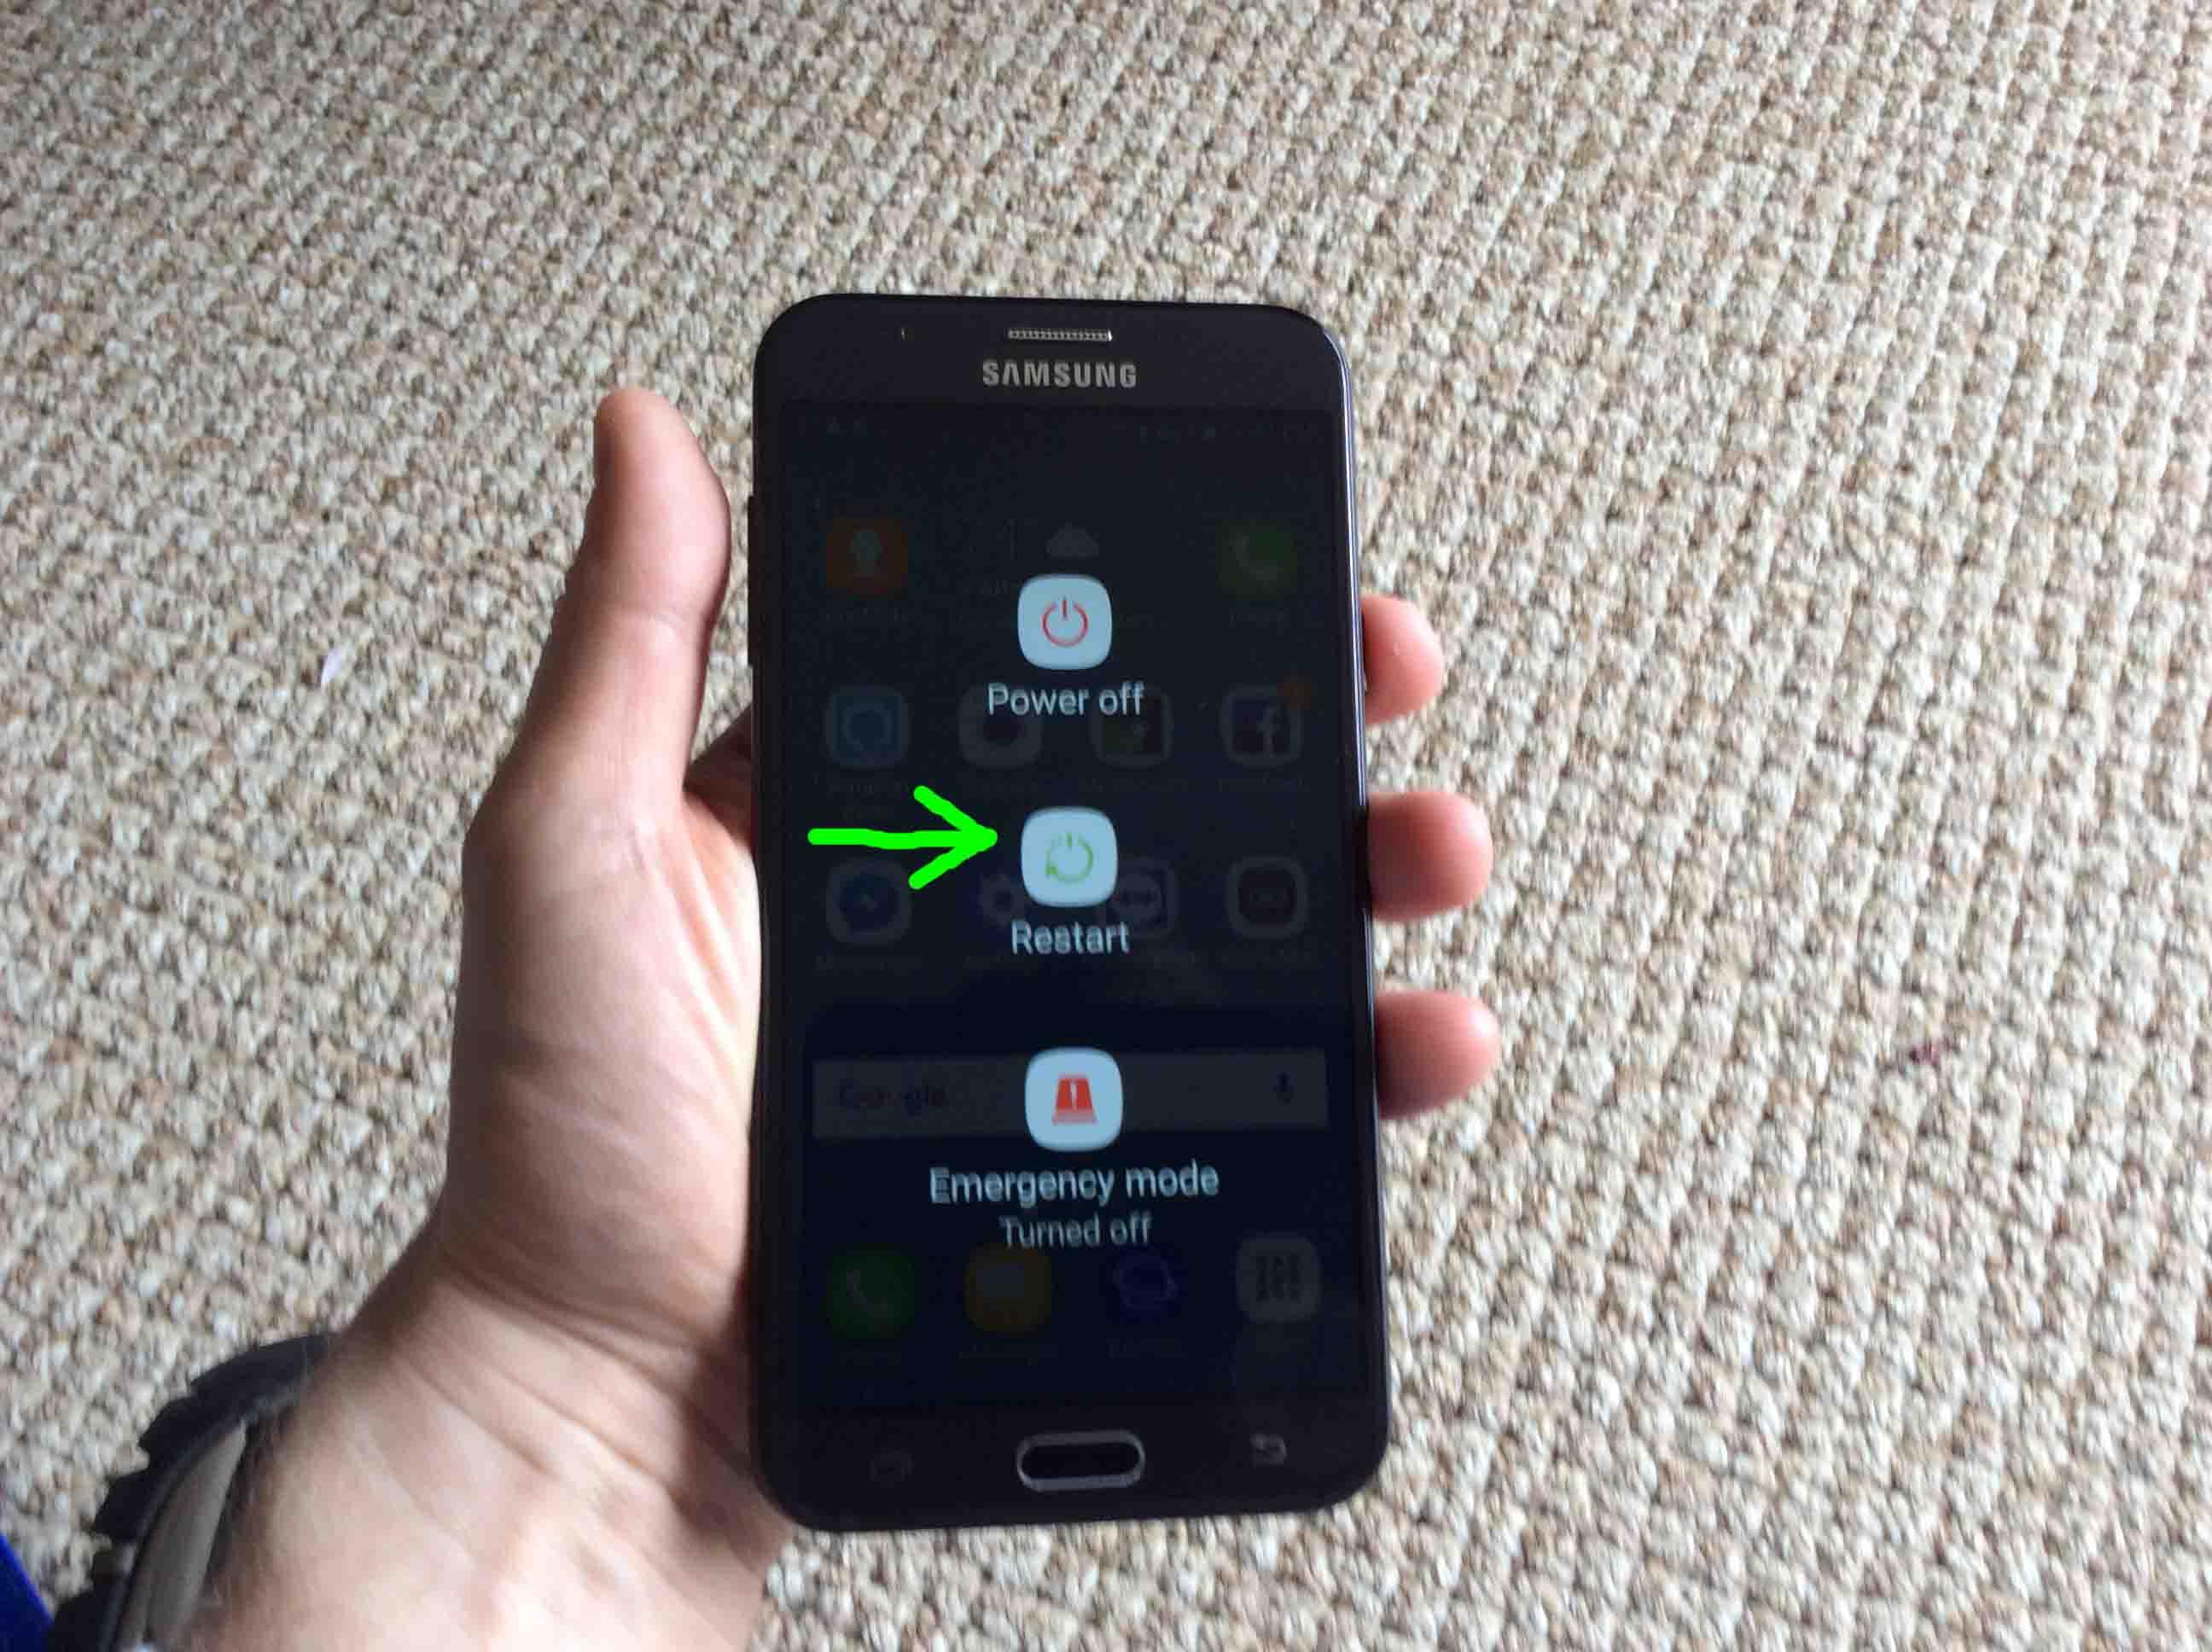 Samsung J7 Force Restart Instructions | Tom's Tek Stop